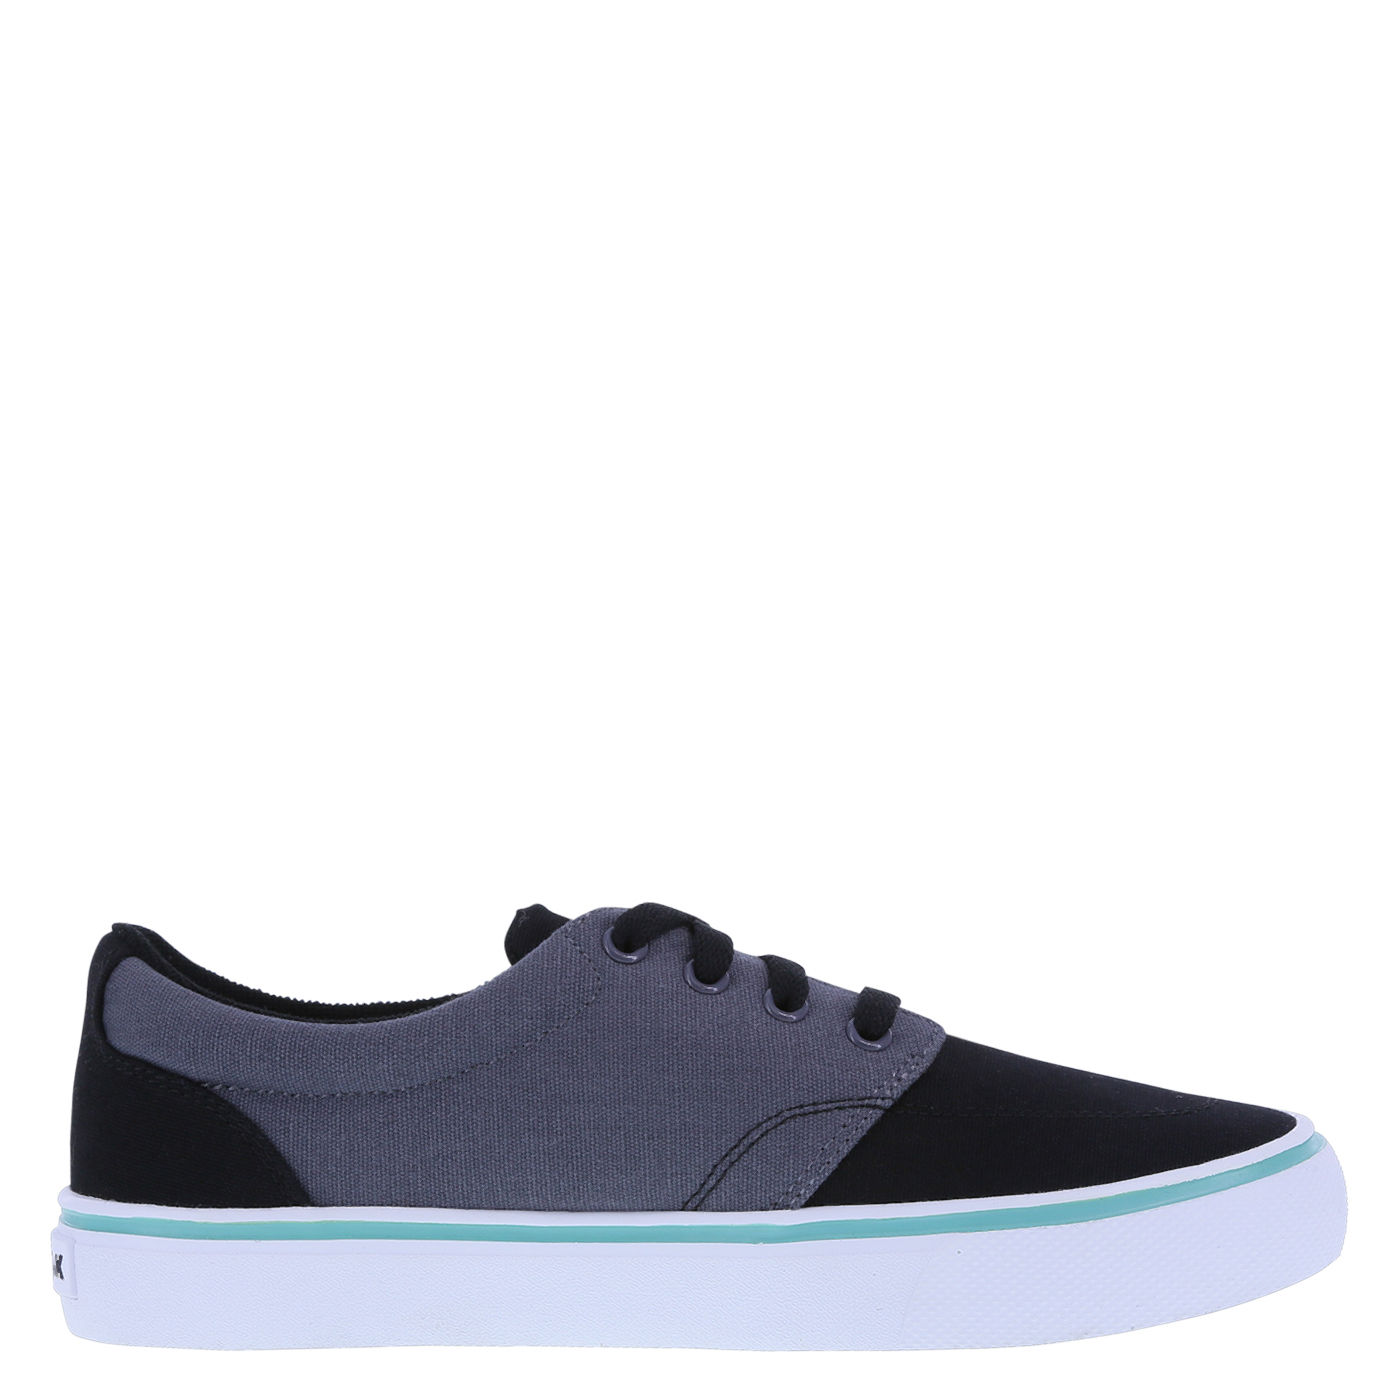 S Airwalk Shoes